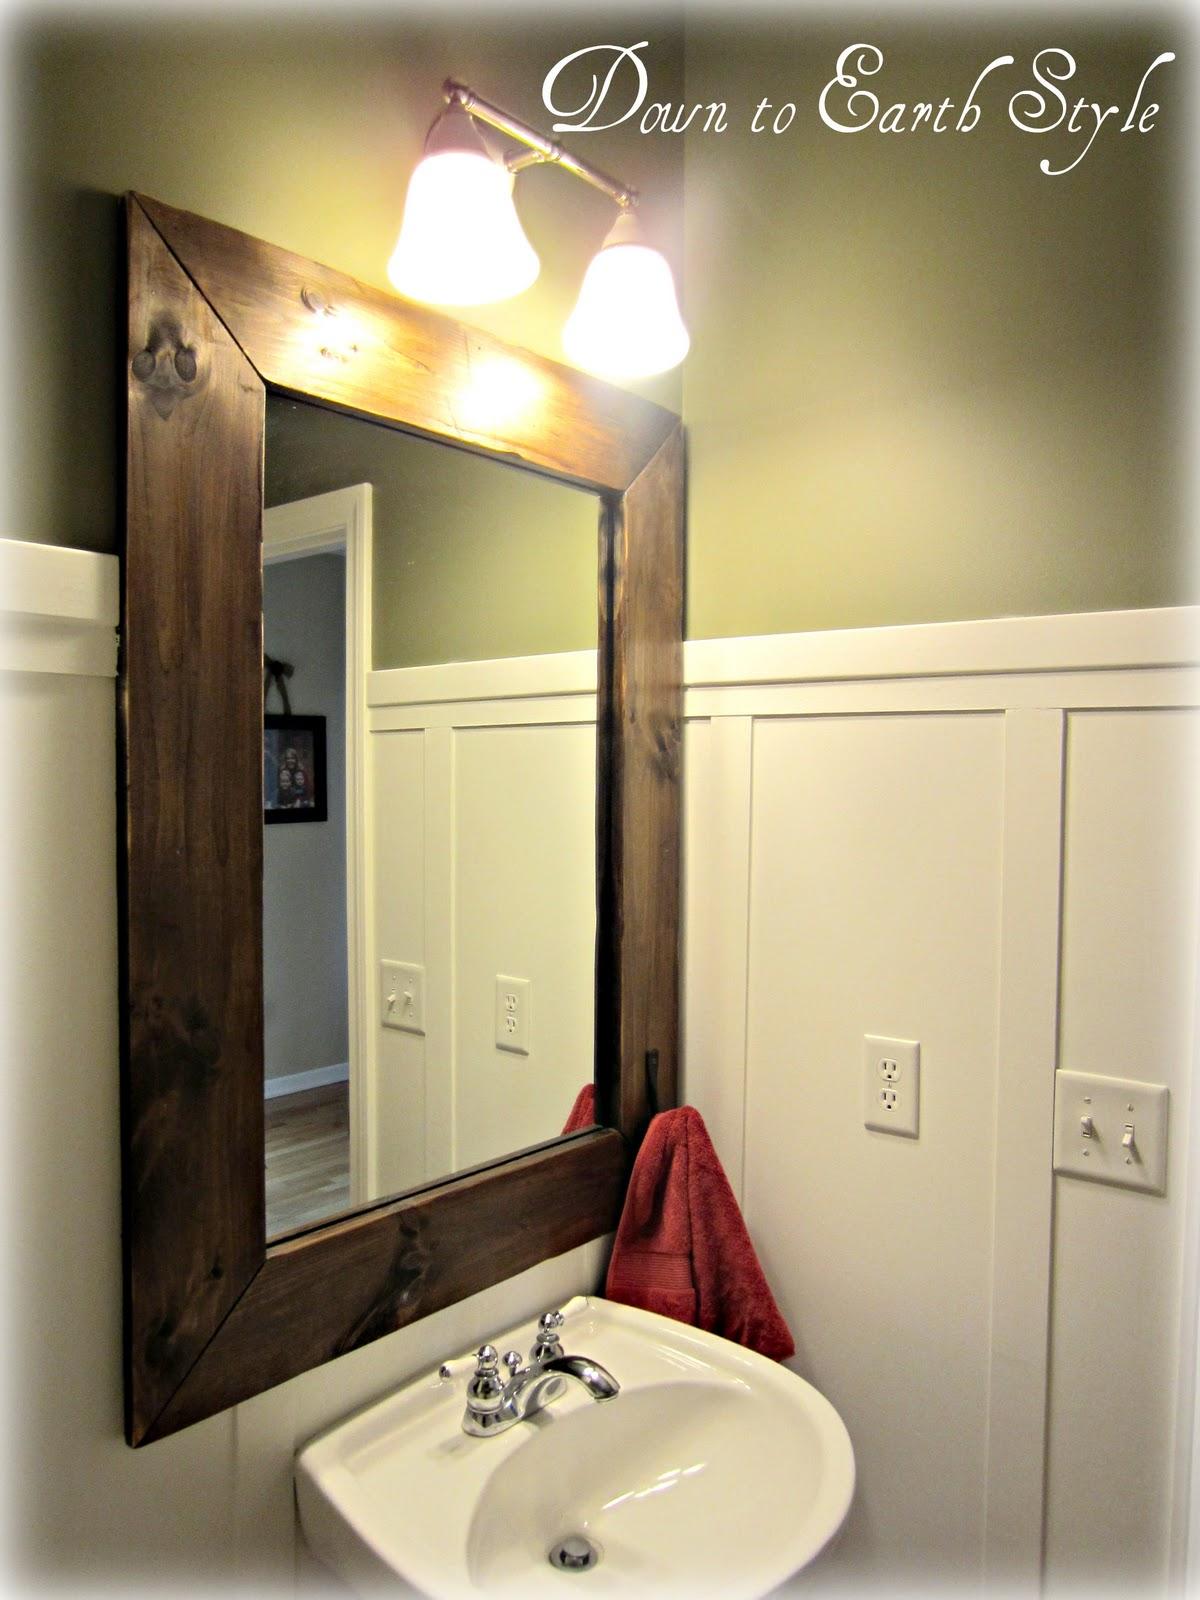 down to earth style board batten bathroom. Black Bedroom Furniture Sets. Home Design Ideas